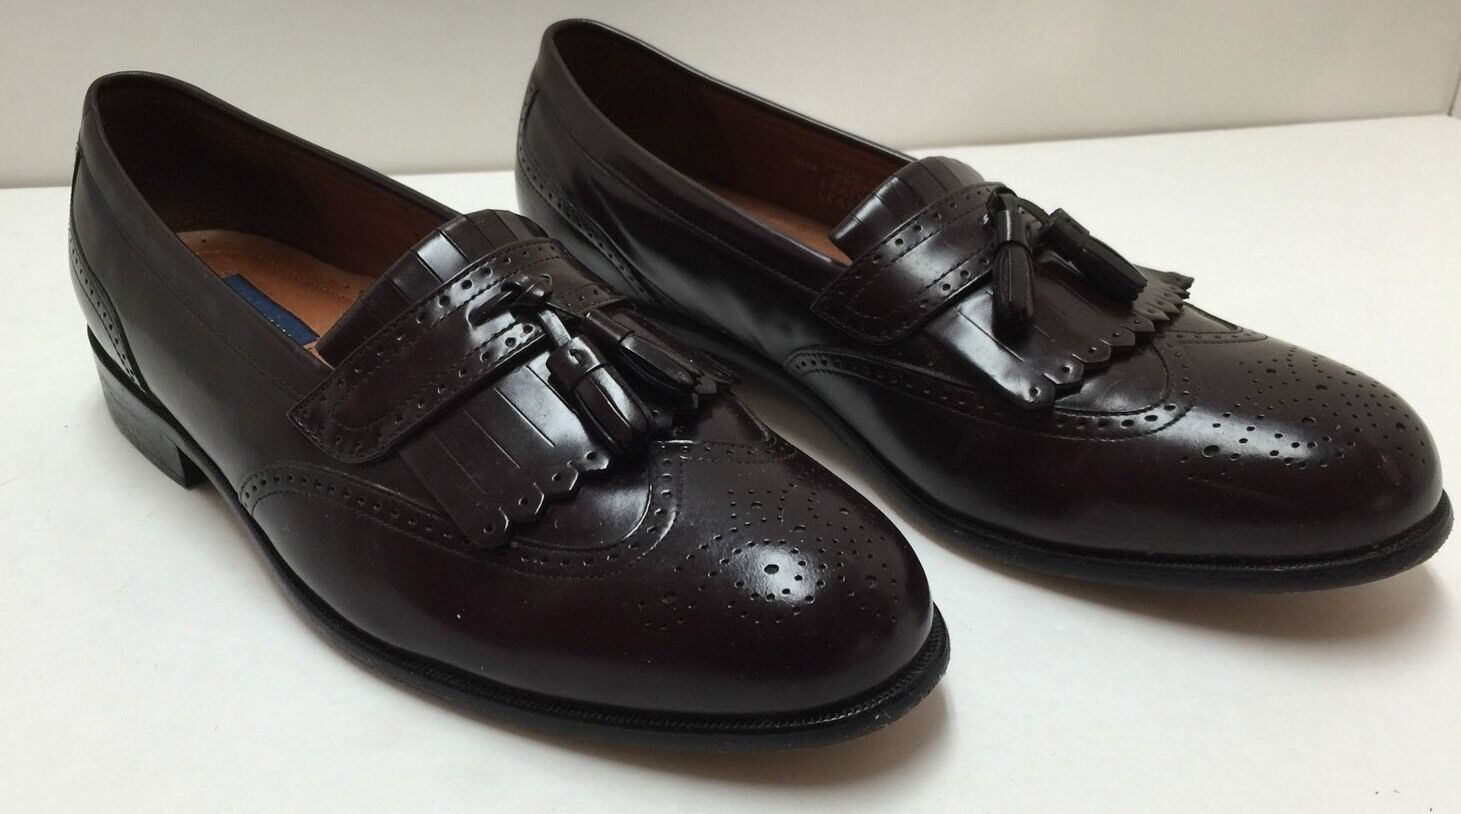 Vintage Mens 7 Bostonian Classics Burgundy Leather Slipons Tassel Loafers Medallion Toe Dress Shoes Oxfords Frill Fringe Wedding Suit Shoes